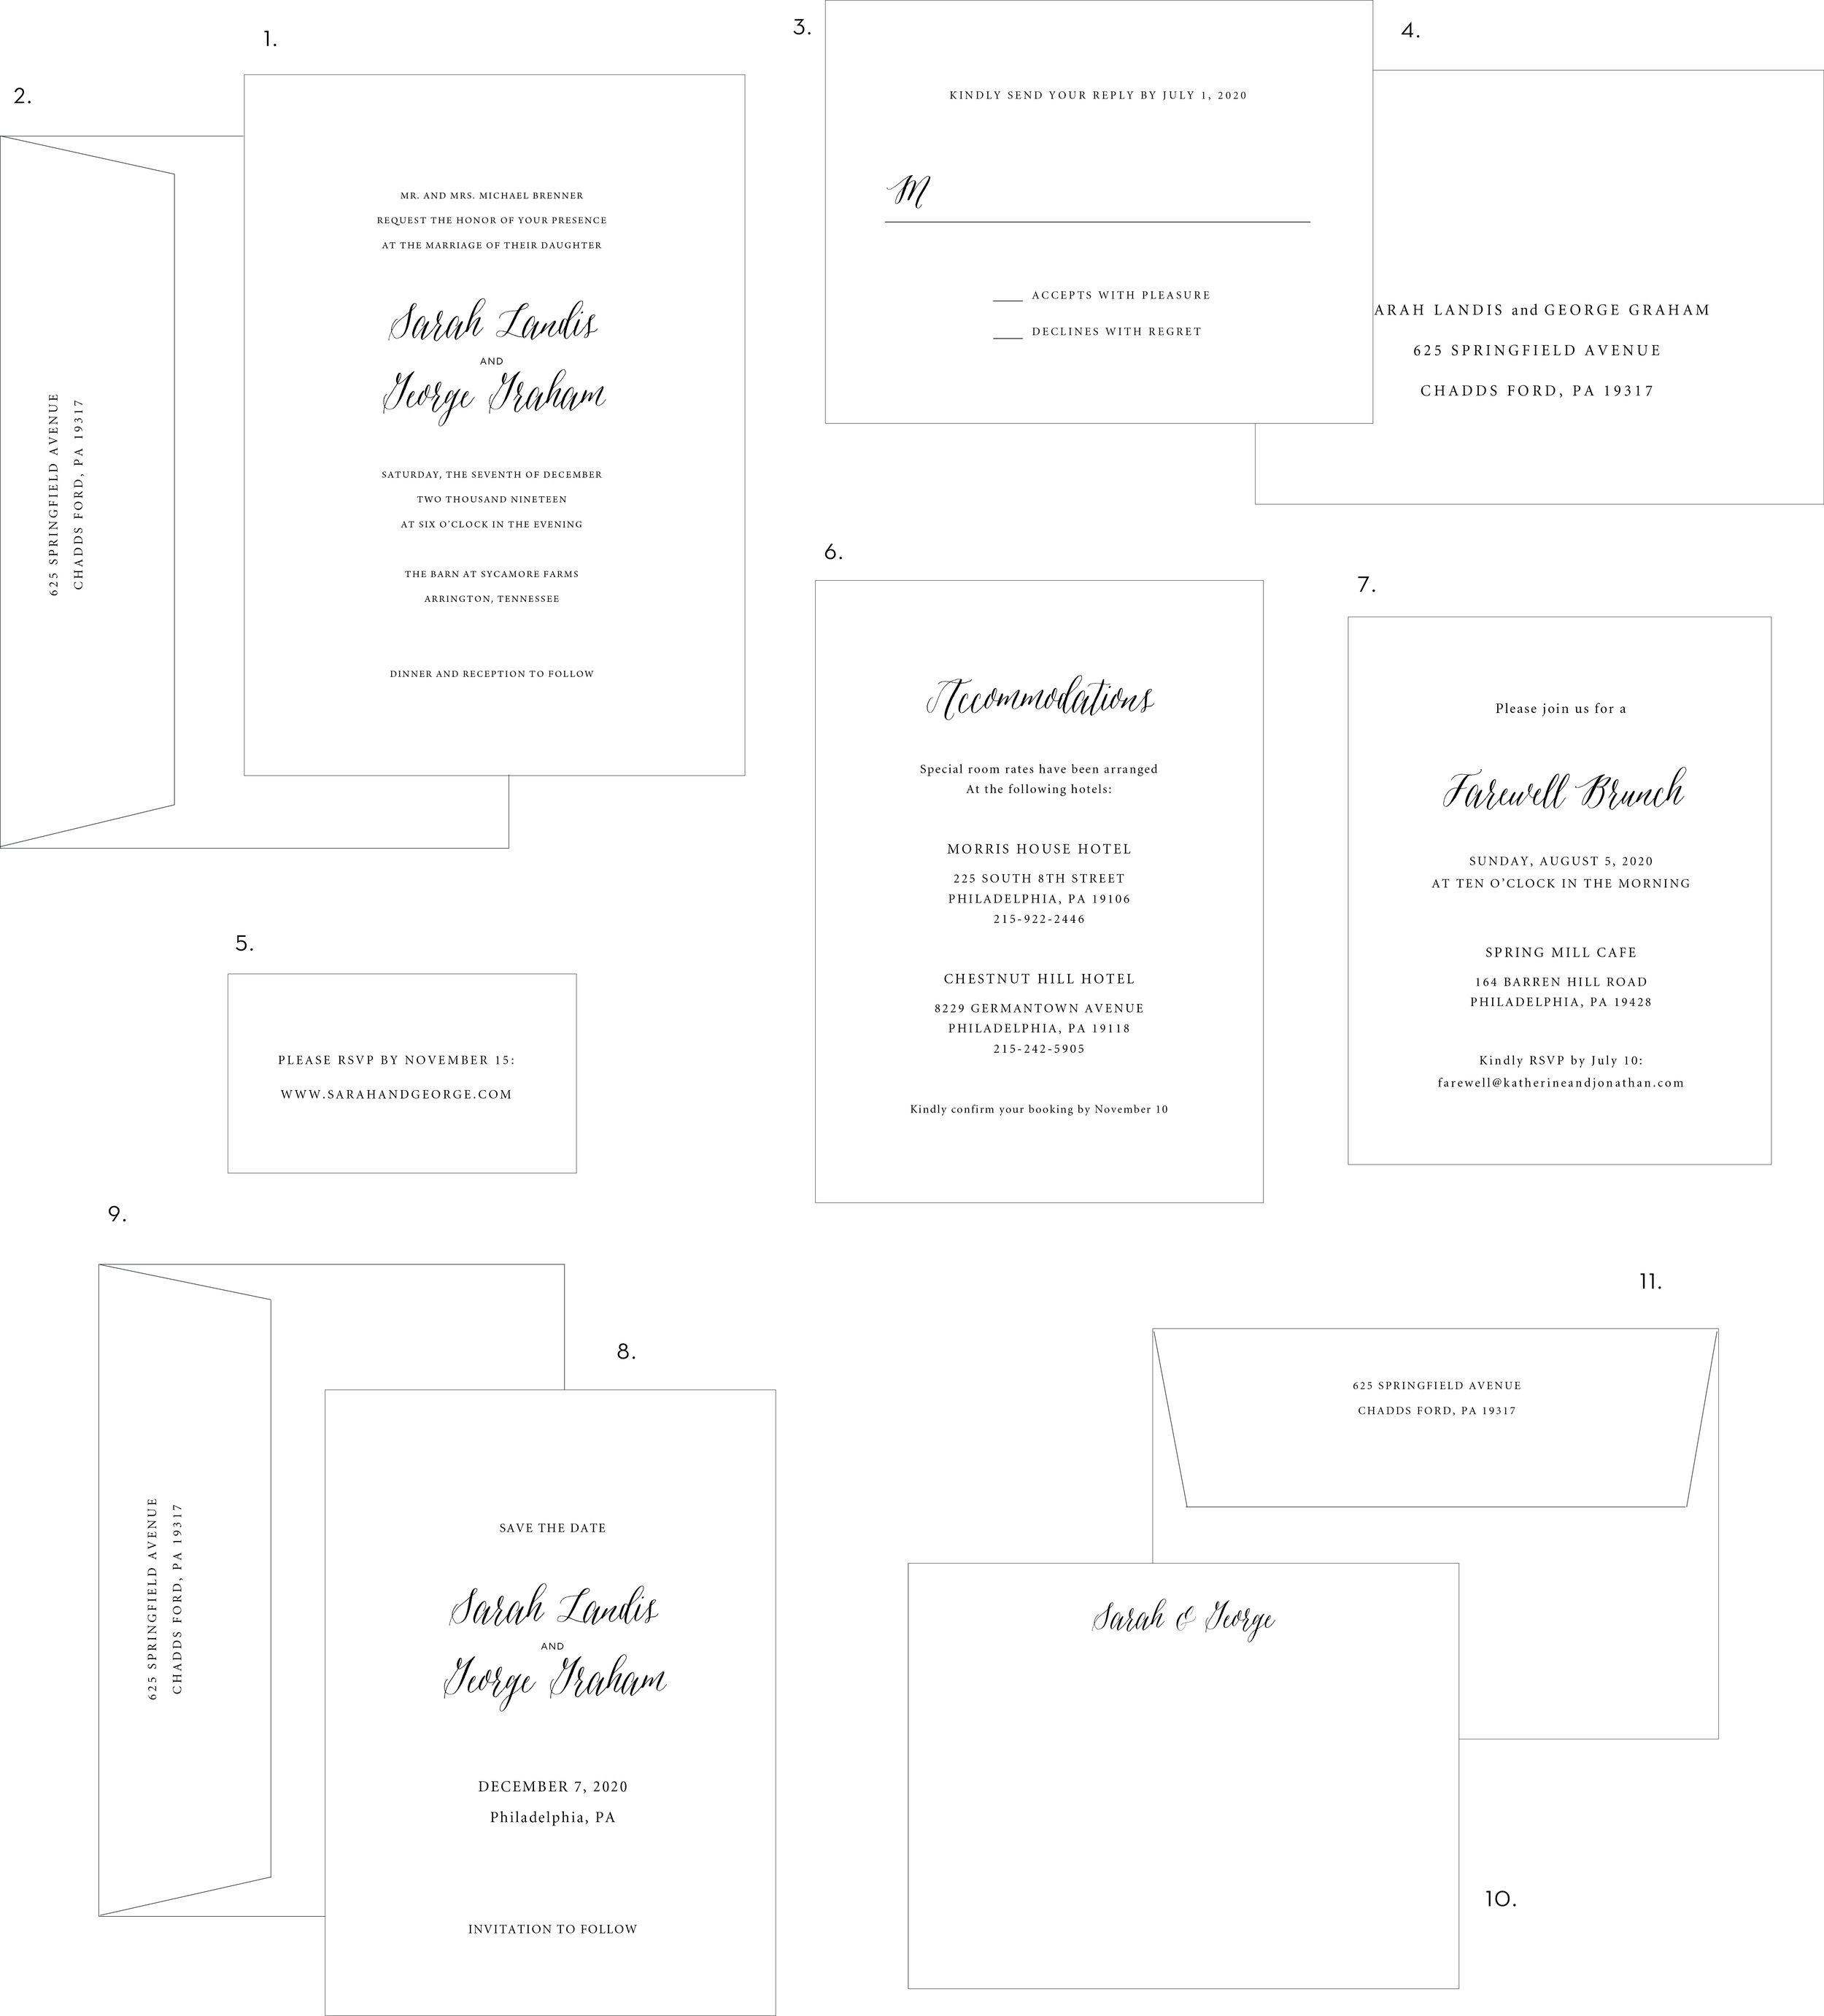 Letterpress Wedding Invitation Scripted Names Style.jpg